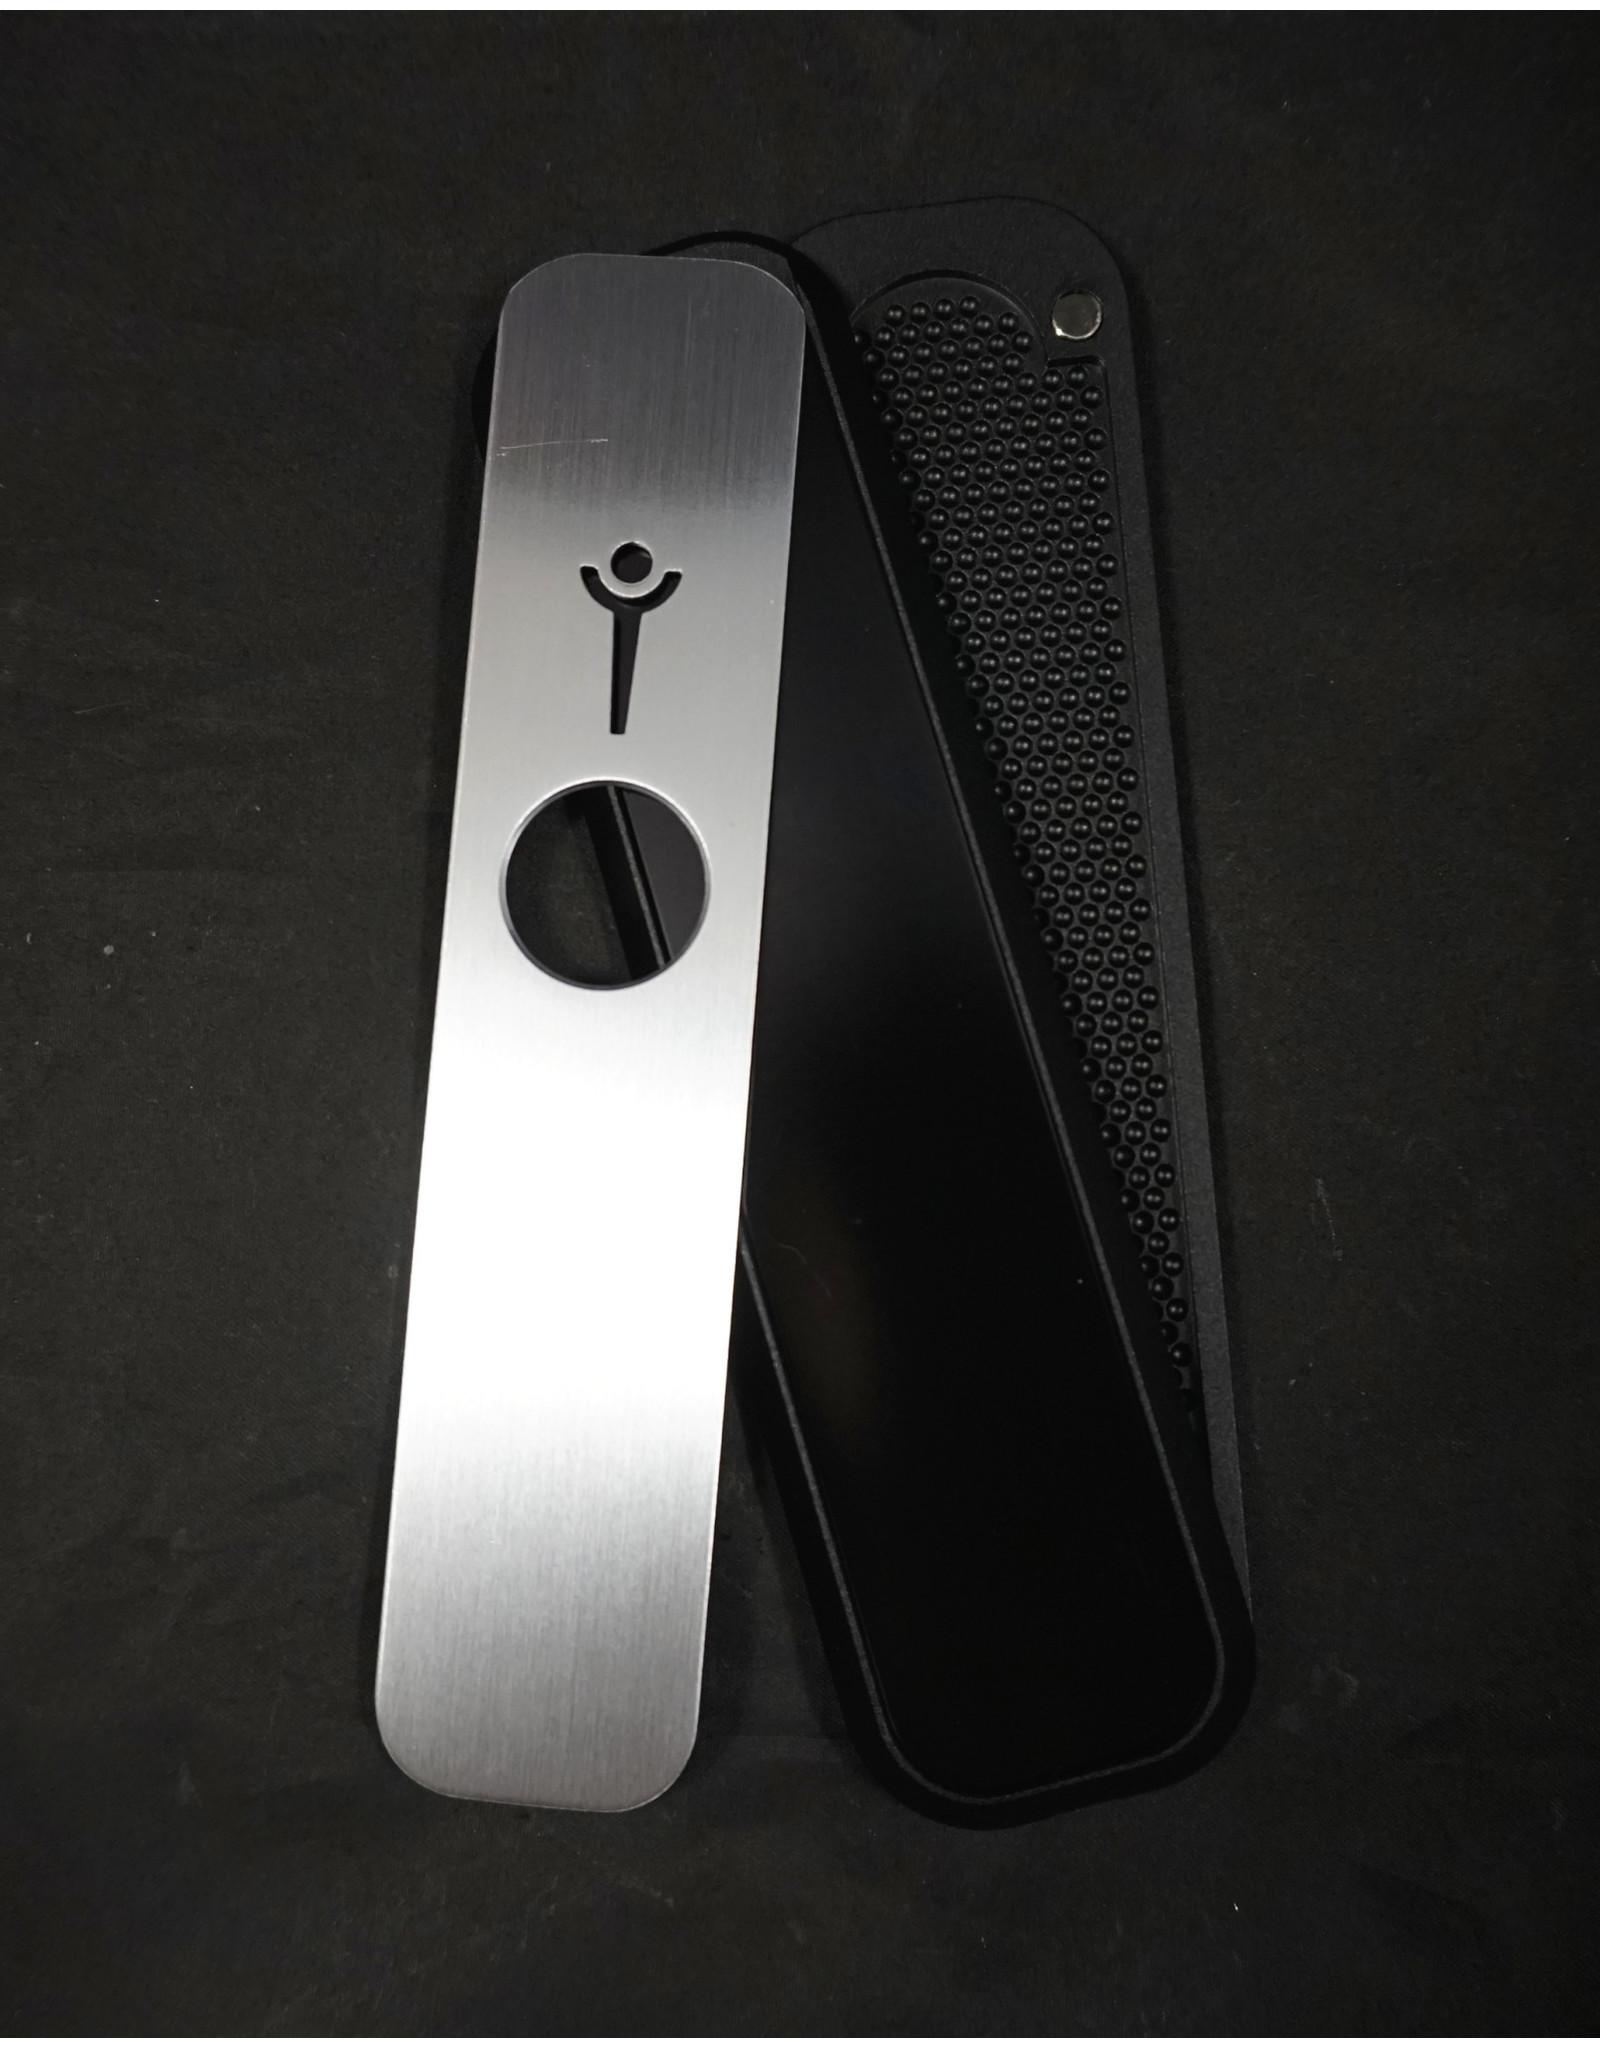 Genius Pipe - Top Secret Black and Silver